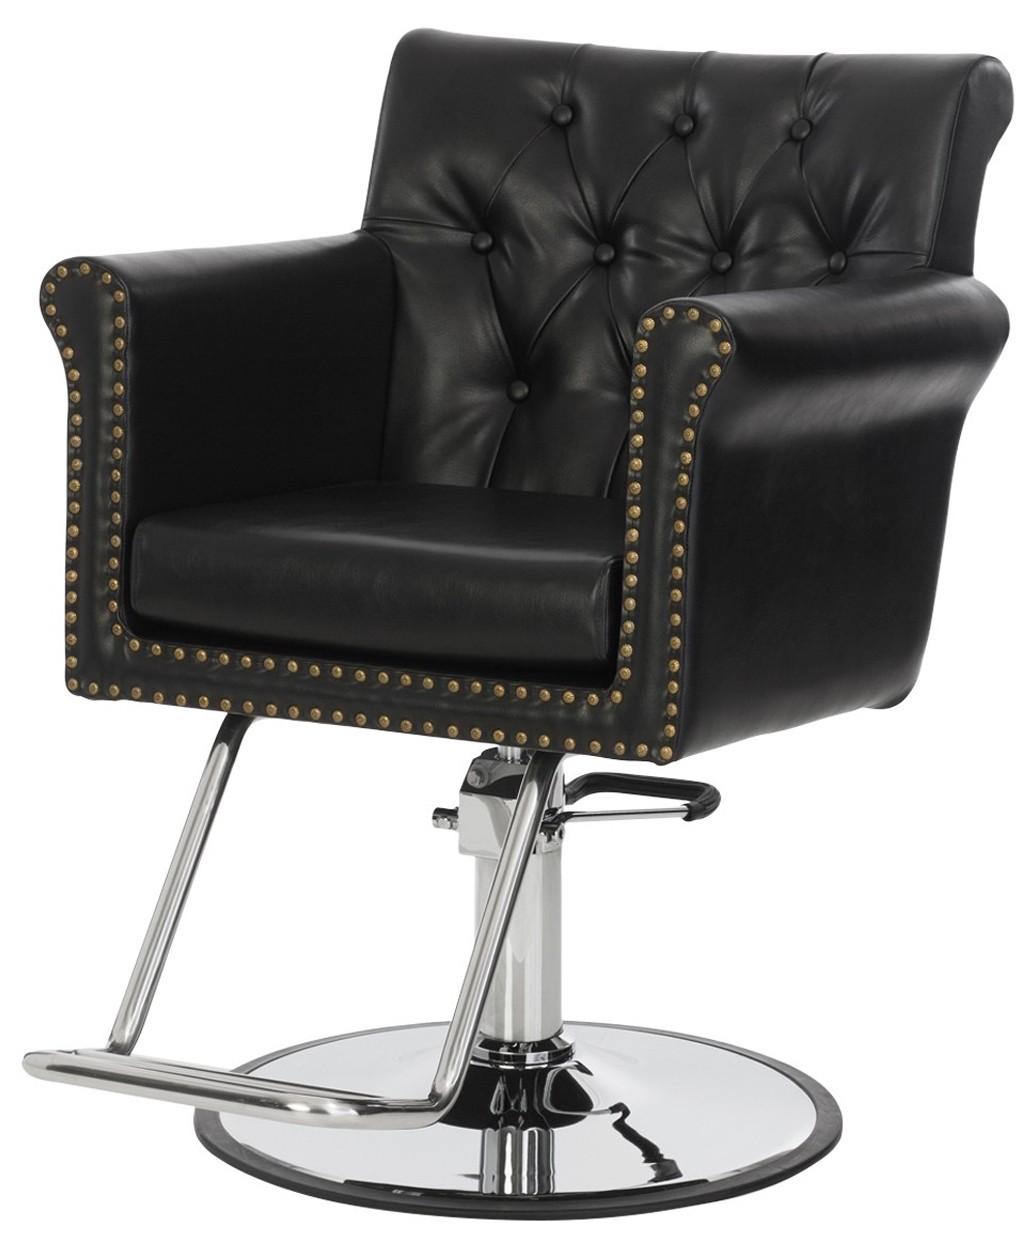 chelsea styling chair rh buyritebeauty com